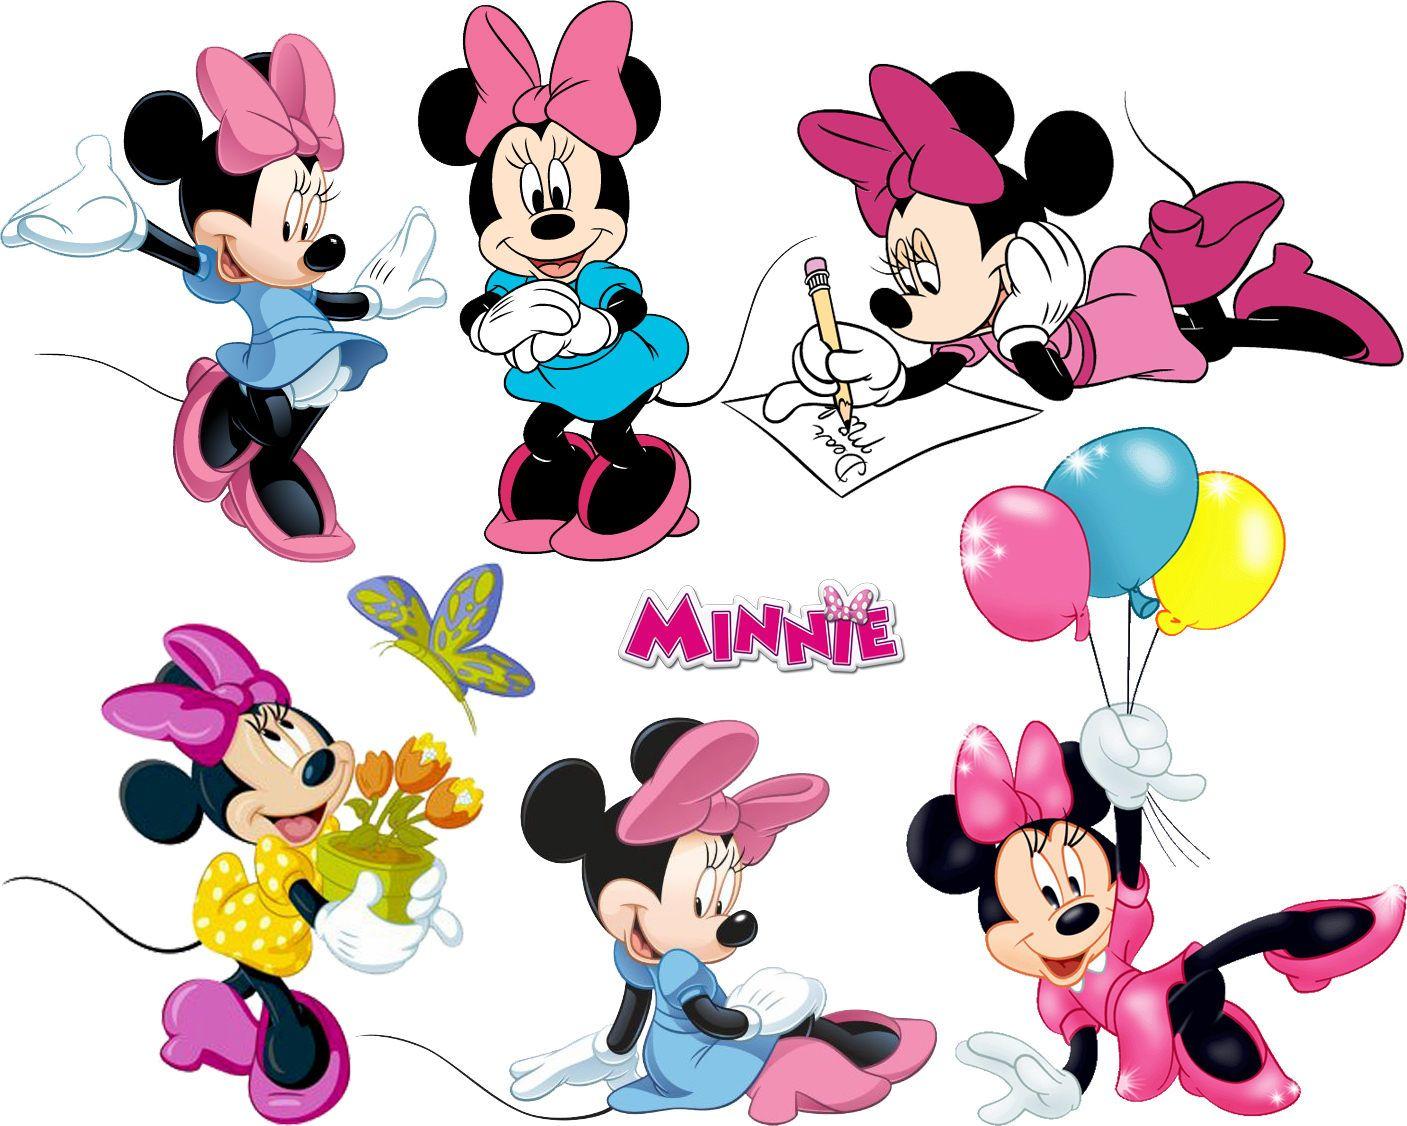 Pics / Gifs / Photographs: Large Mickey Mouse pictures   Mickey mouse  pictures, Mickey mouse, Mickey mouse cartoon